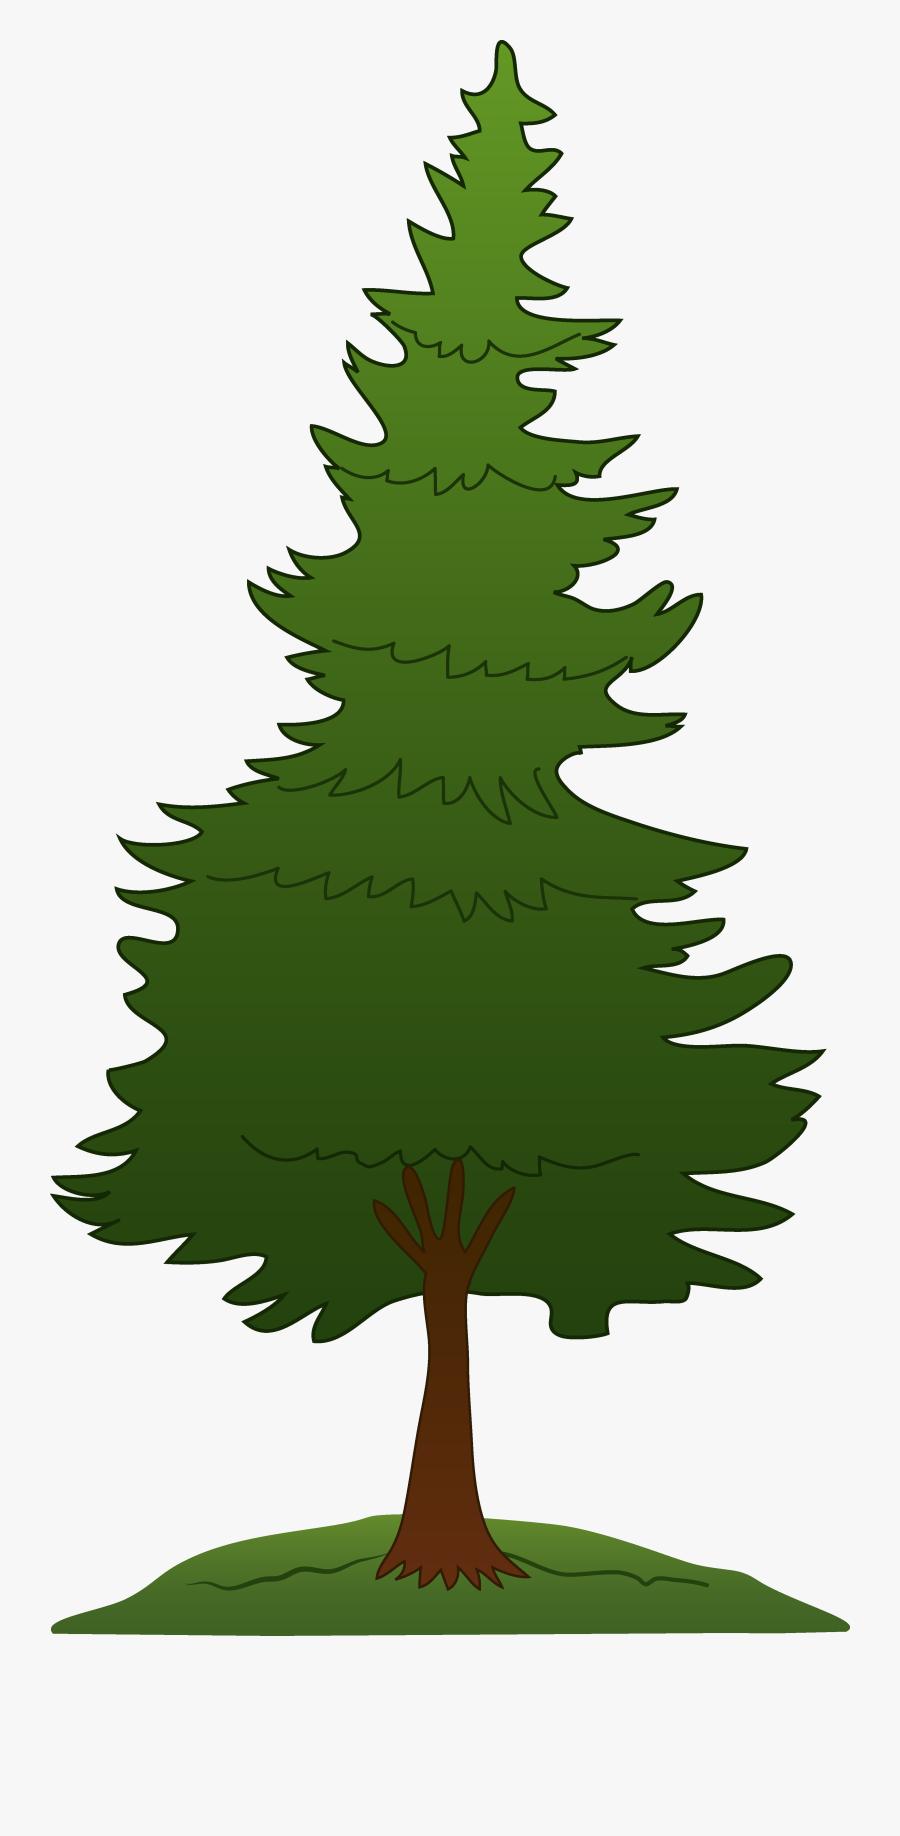 Redwood Tree Clip Art - Pine Tree Clipart Png, Transparent Clipart